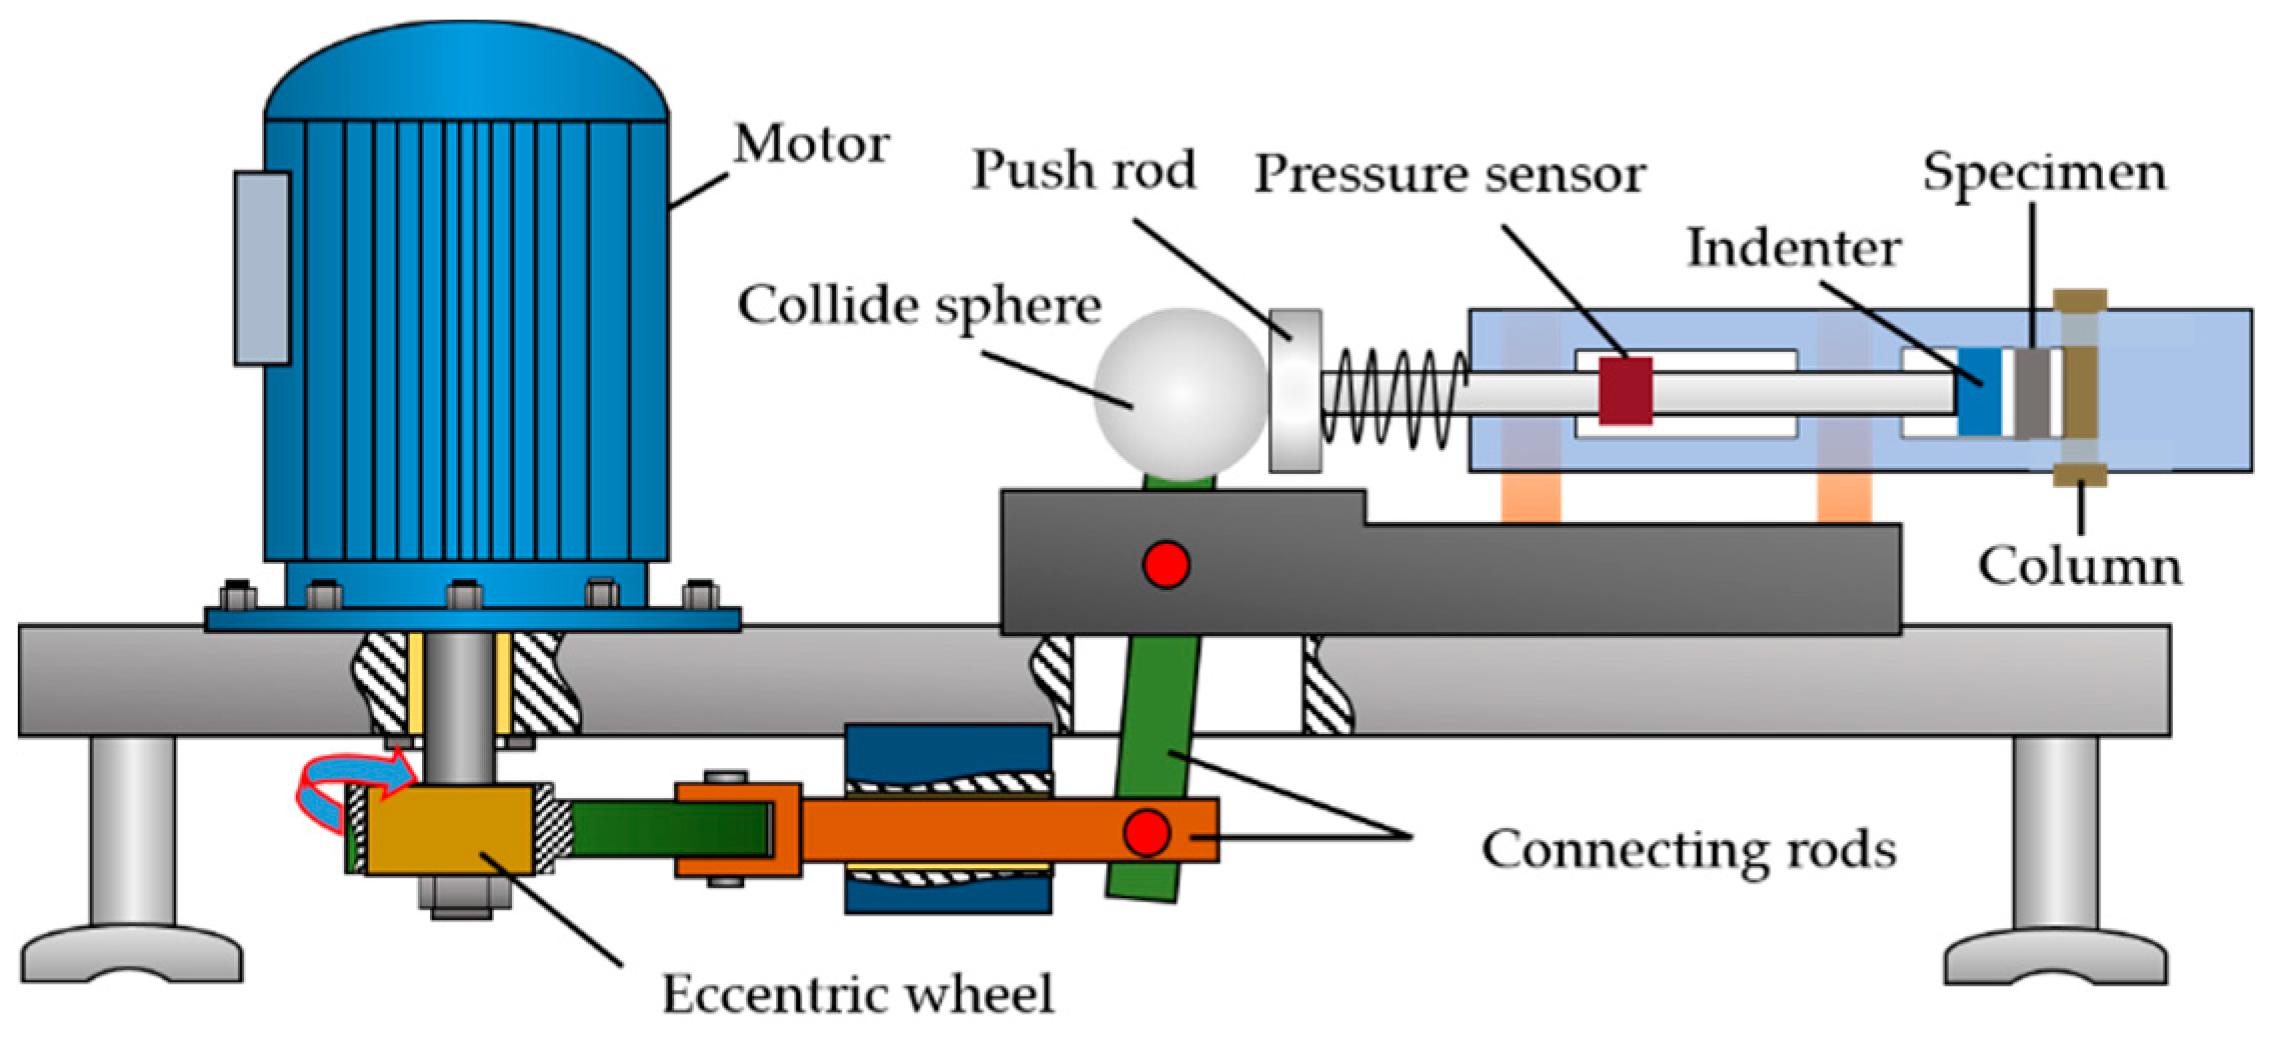 Metal Bending Machine >> Metals | Free Full-Text | Characteristics of Metal ...